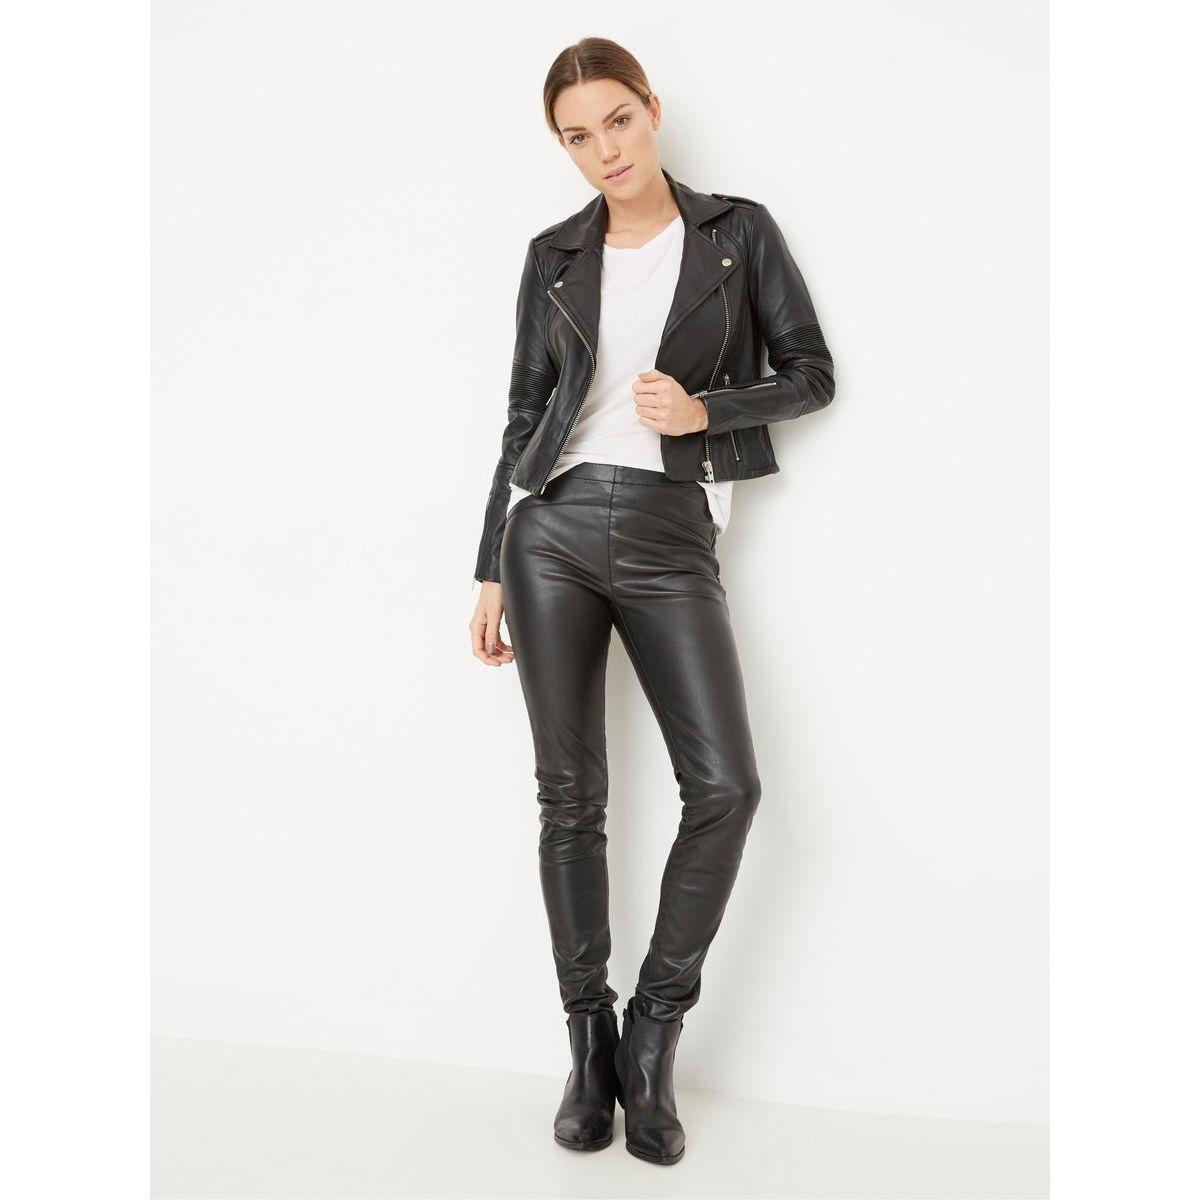 Leggings Imitated NW Leather